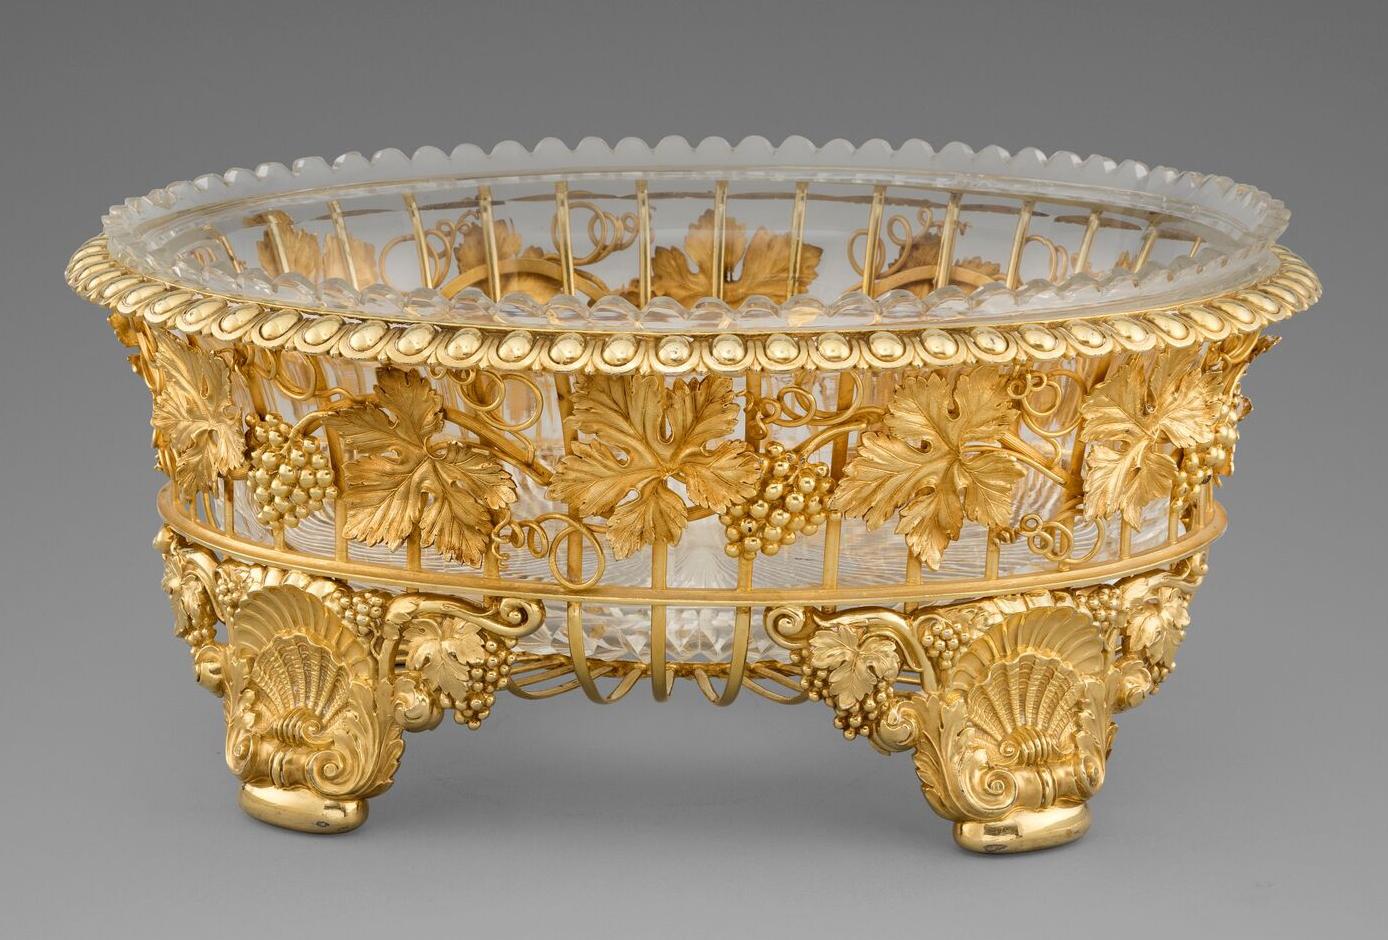 An Elegant George III Dessert Basket